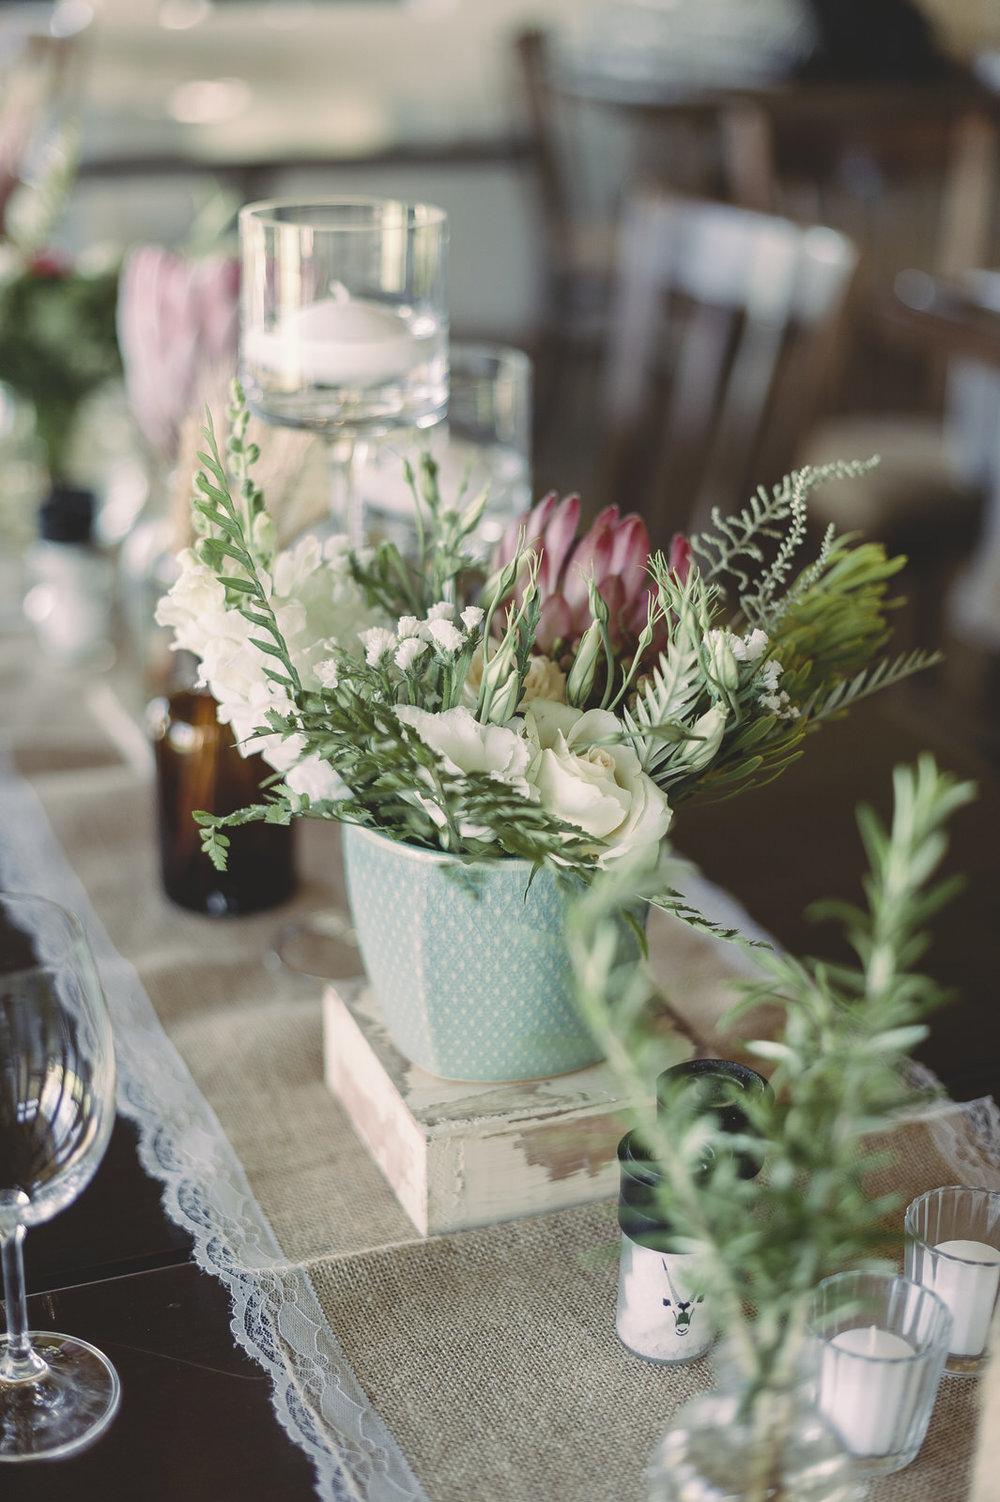 RyanParker_Wedding_CapeTown_Hermanus_GabrielsKloof_E+P_DSC_6261.jpg